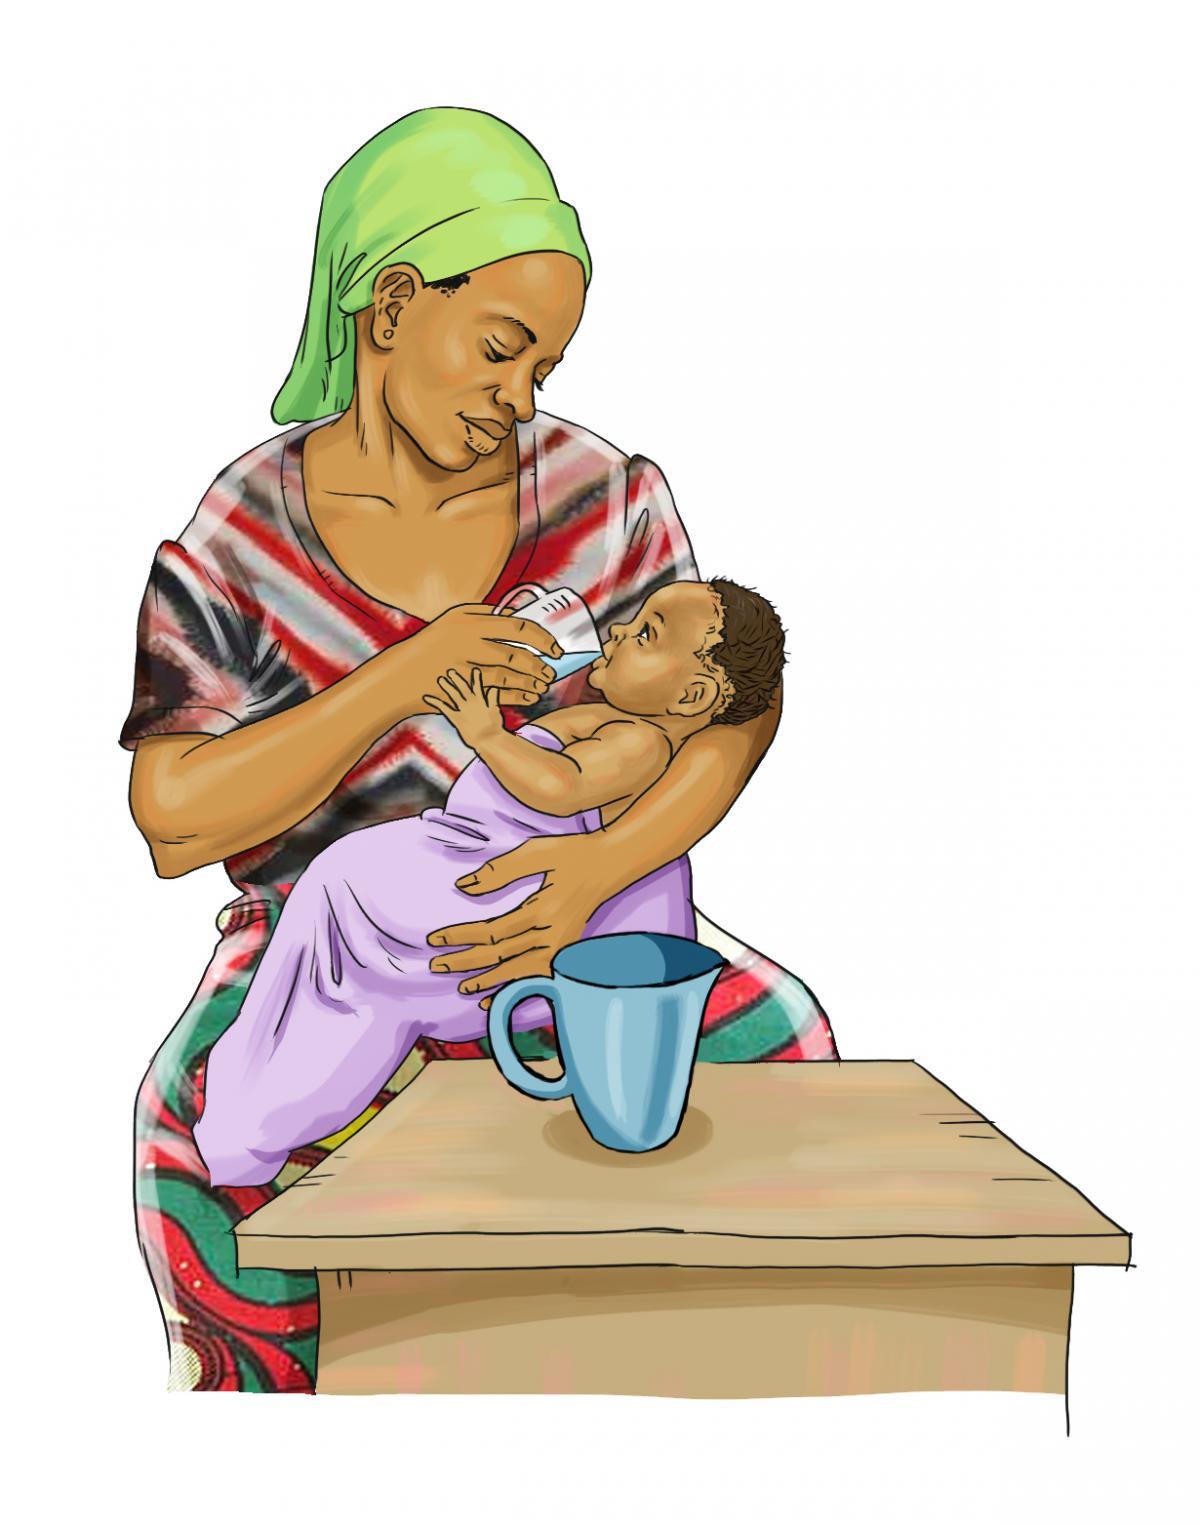 Breastfeeding - Giving baby water will increase risk of diarrhea 0-6mo - 01 - Burkina Faso